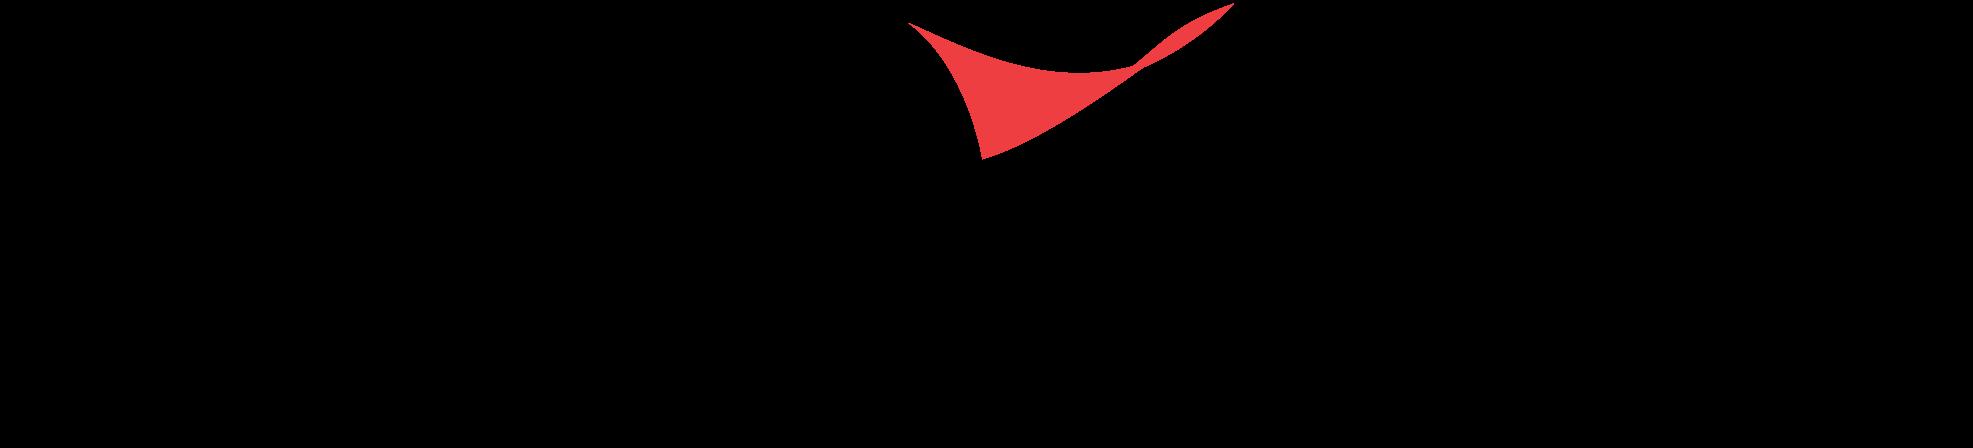 https://www.apexanalytix.com/sites/default/files/revslider/image/conocophillips-logo-png.png